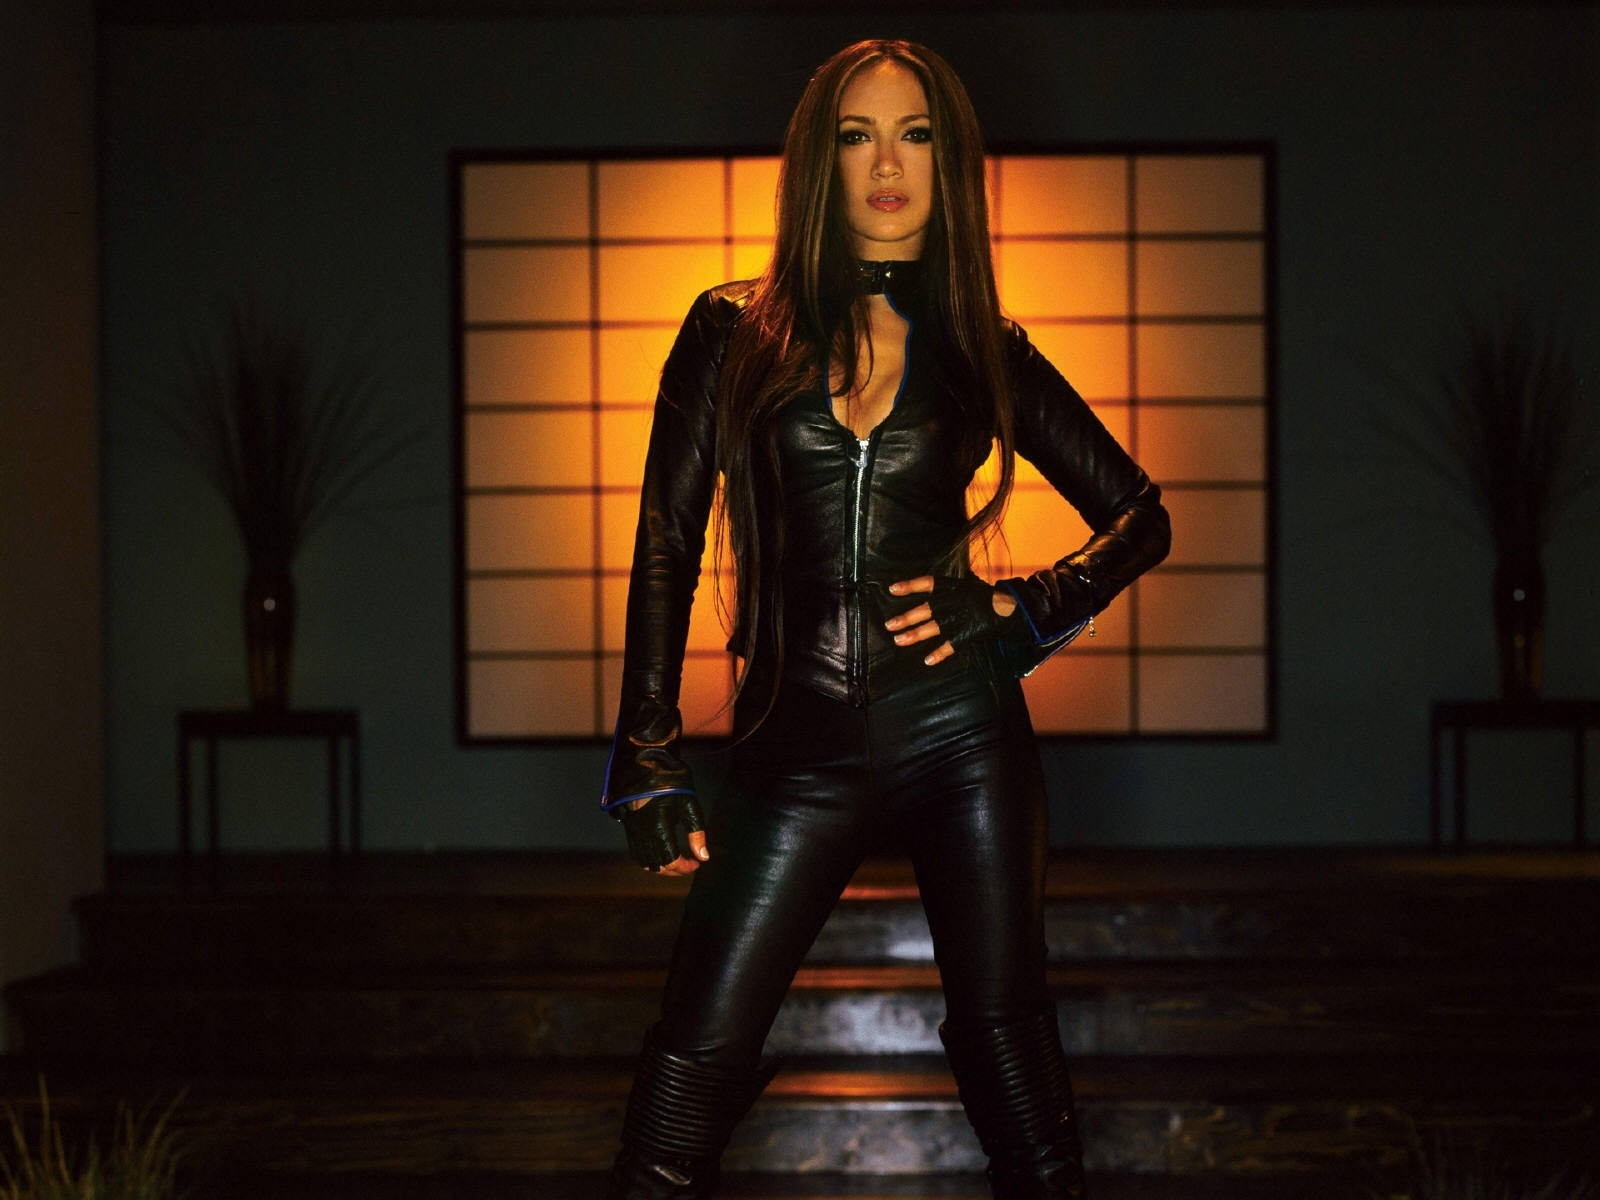 Wallpaper: una splendida immagine di Jennifer Lopez